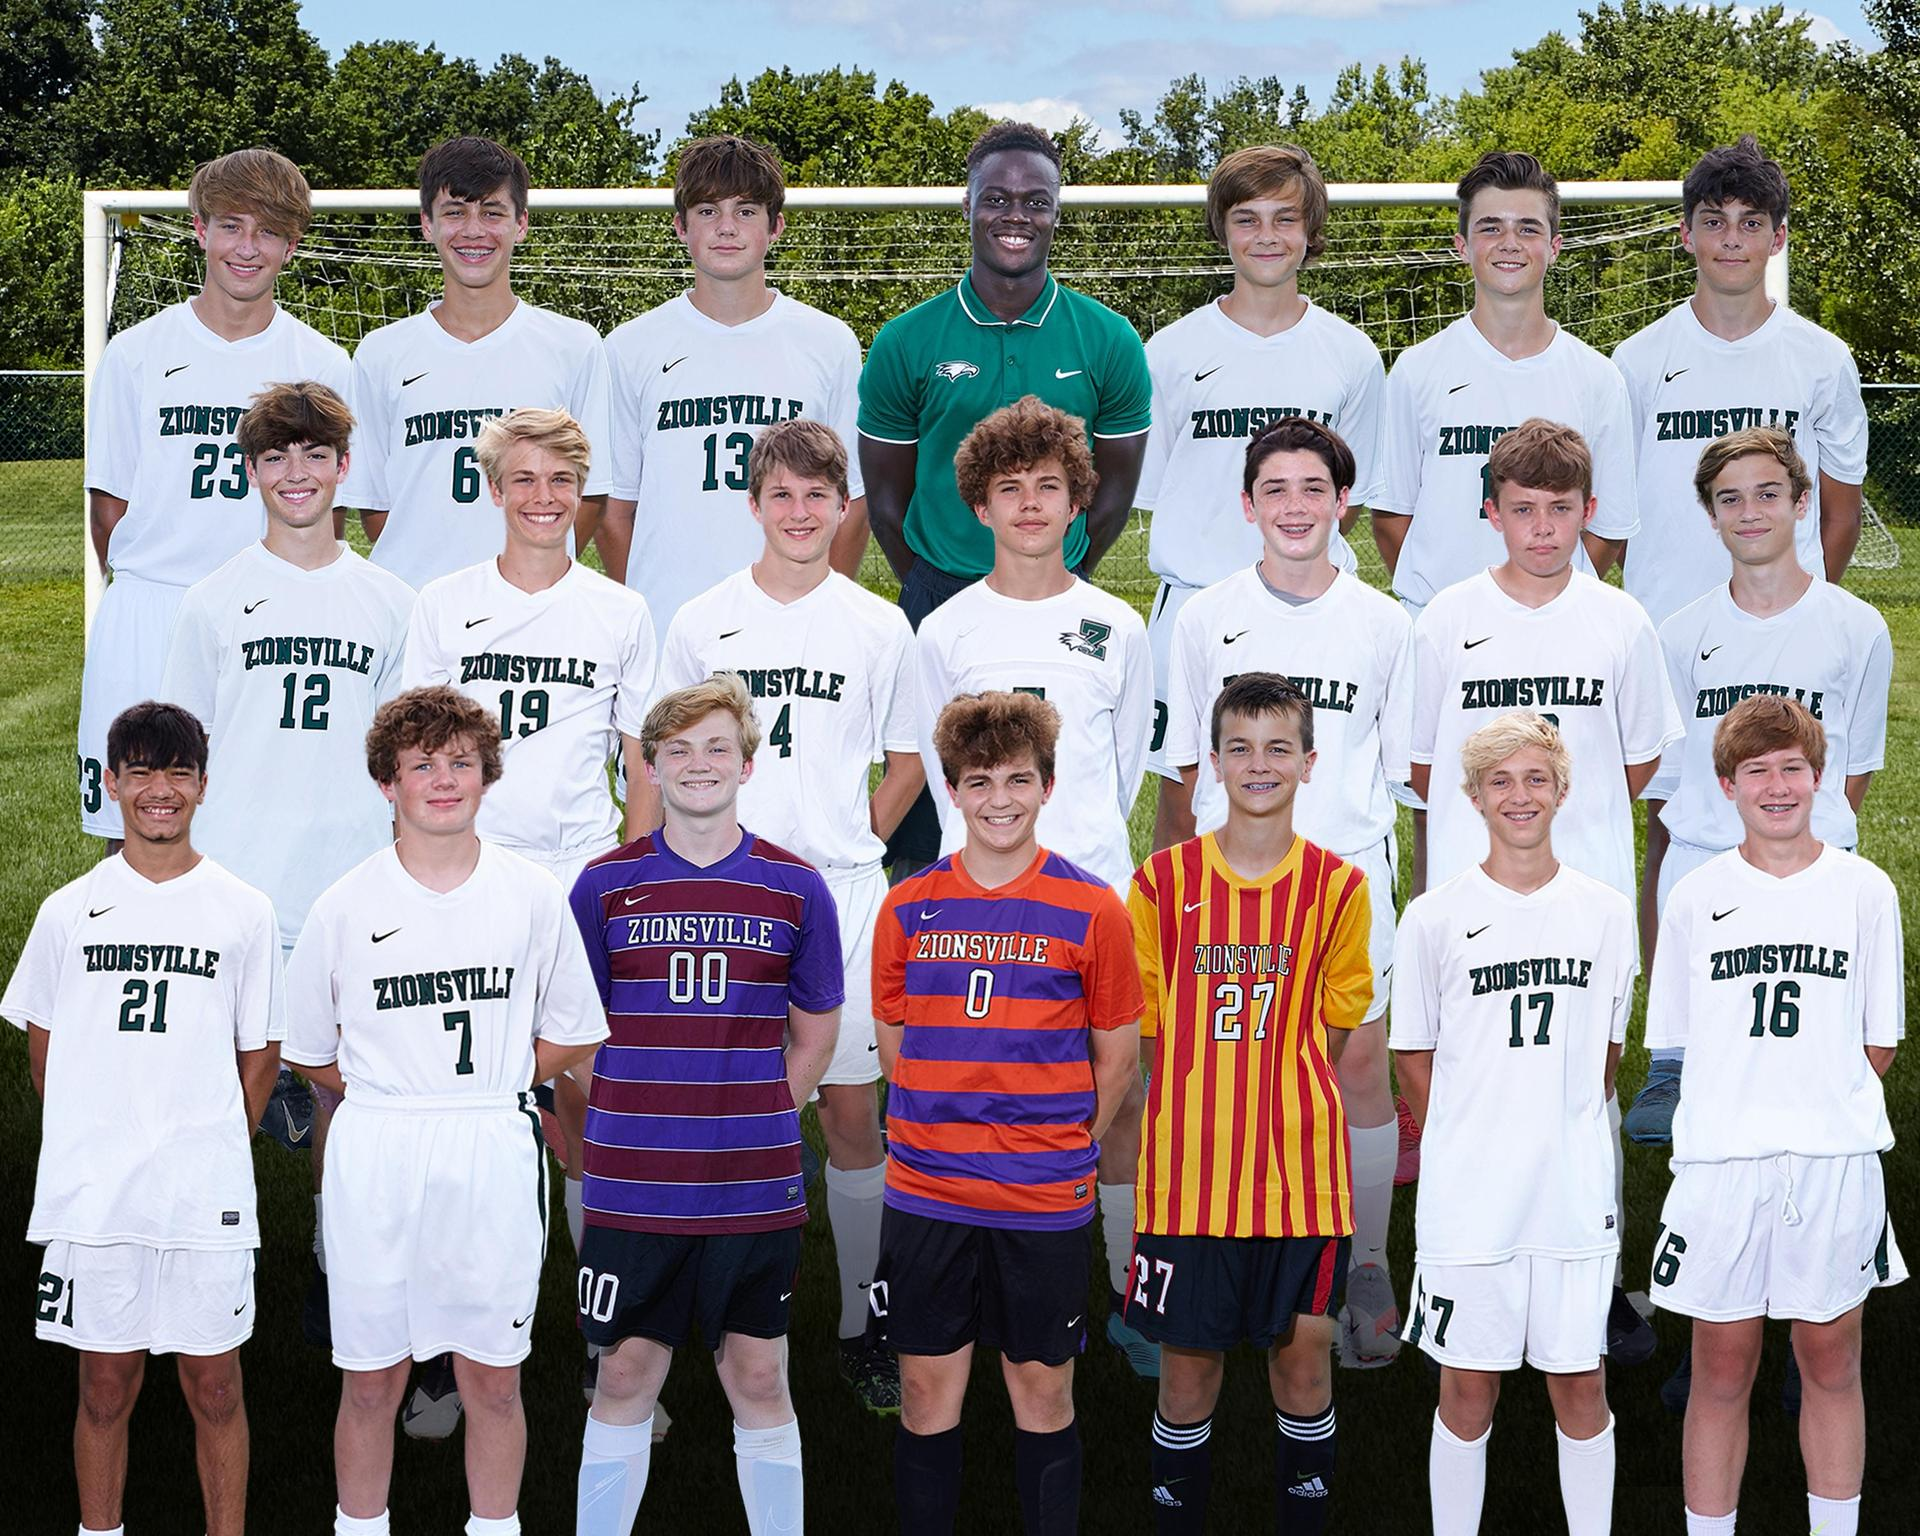 Boys C Soccer Team